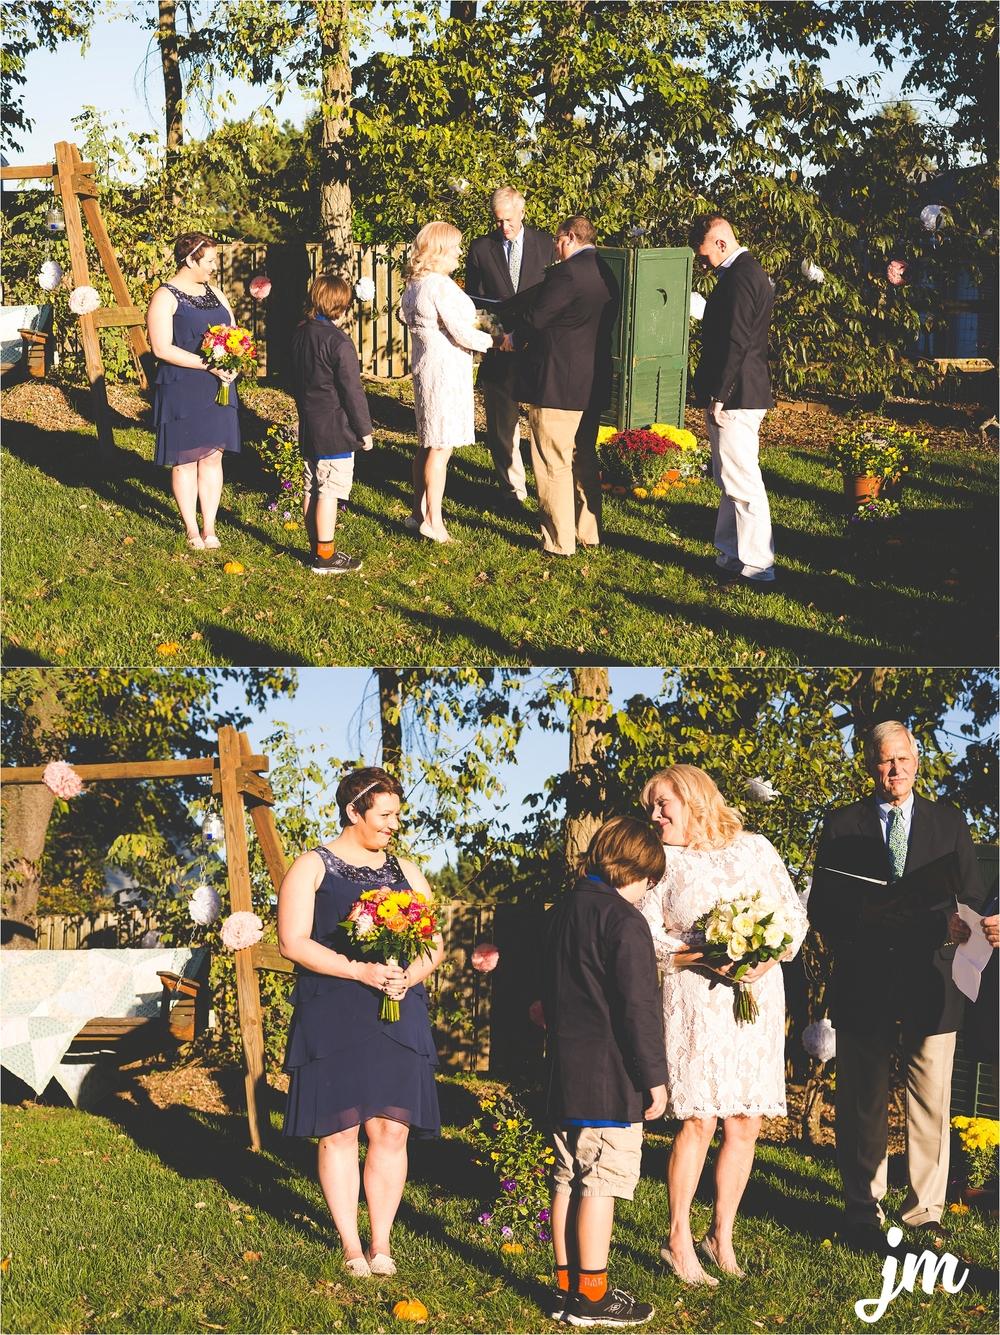 backyard-wedding-pacific-northwest-photographer-jannicka-mayte_0013.jpg